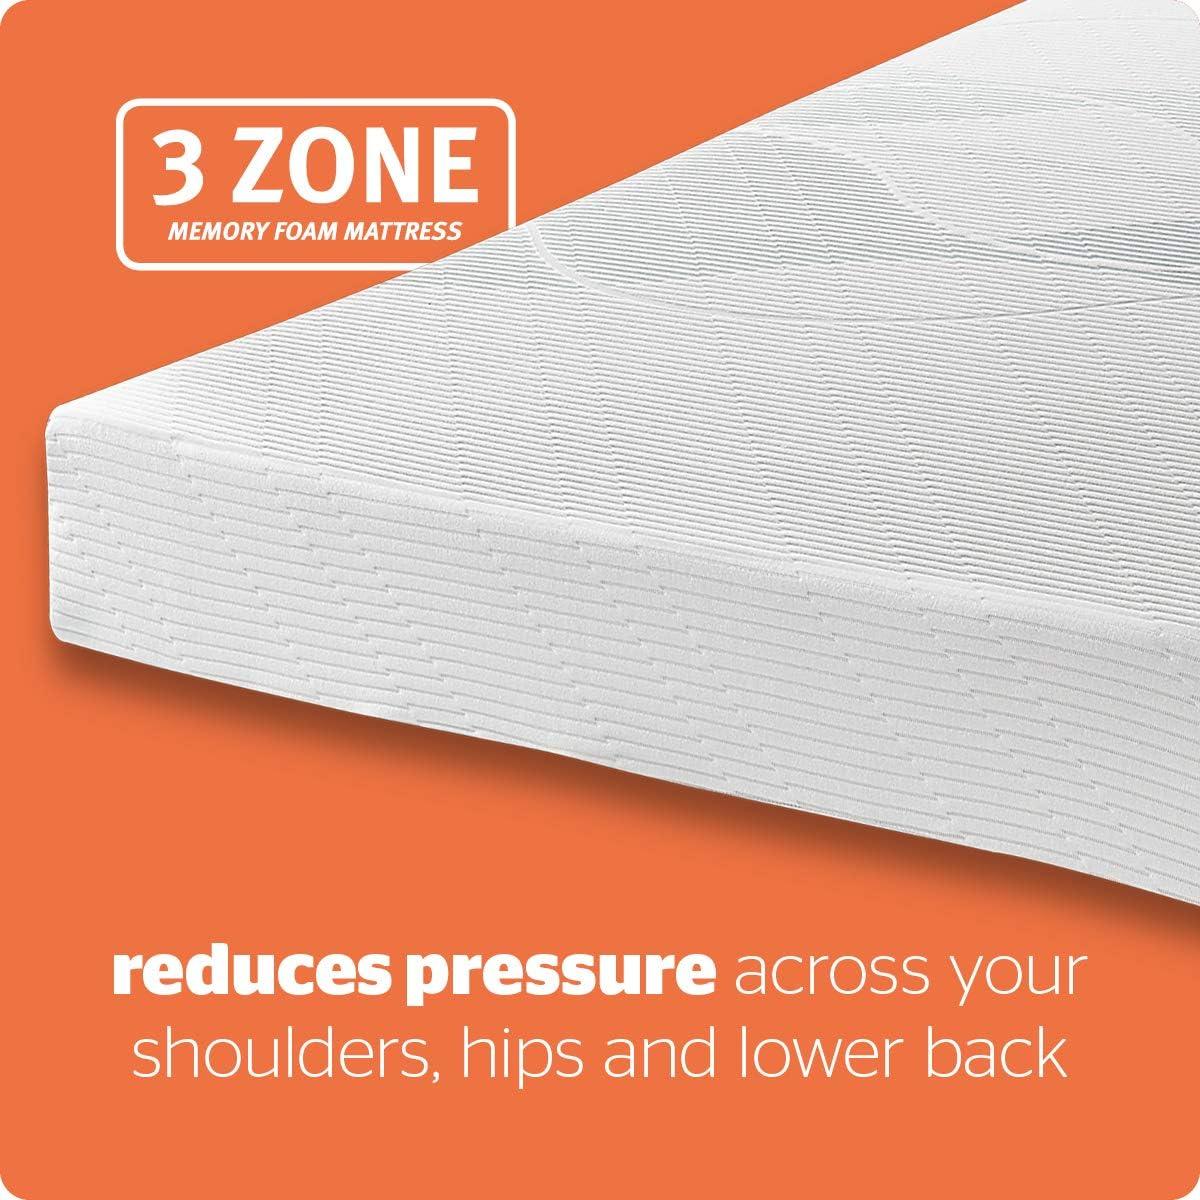 Single Medium Made in the UK Silentnight 3 Zone Memory Foam Rolled Mattress